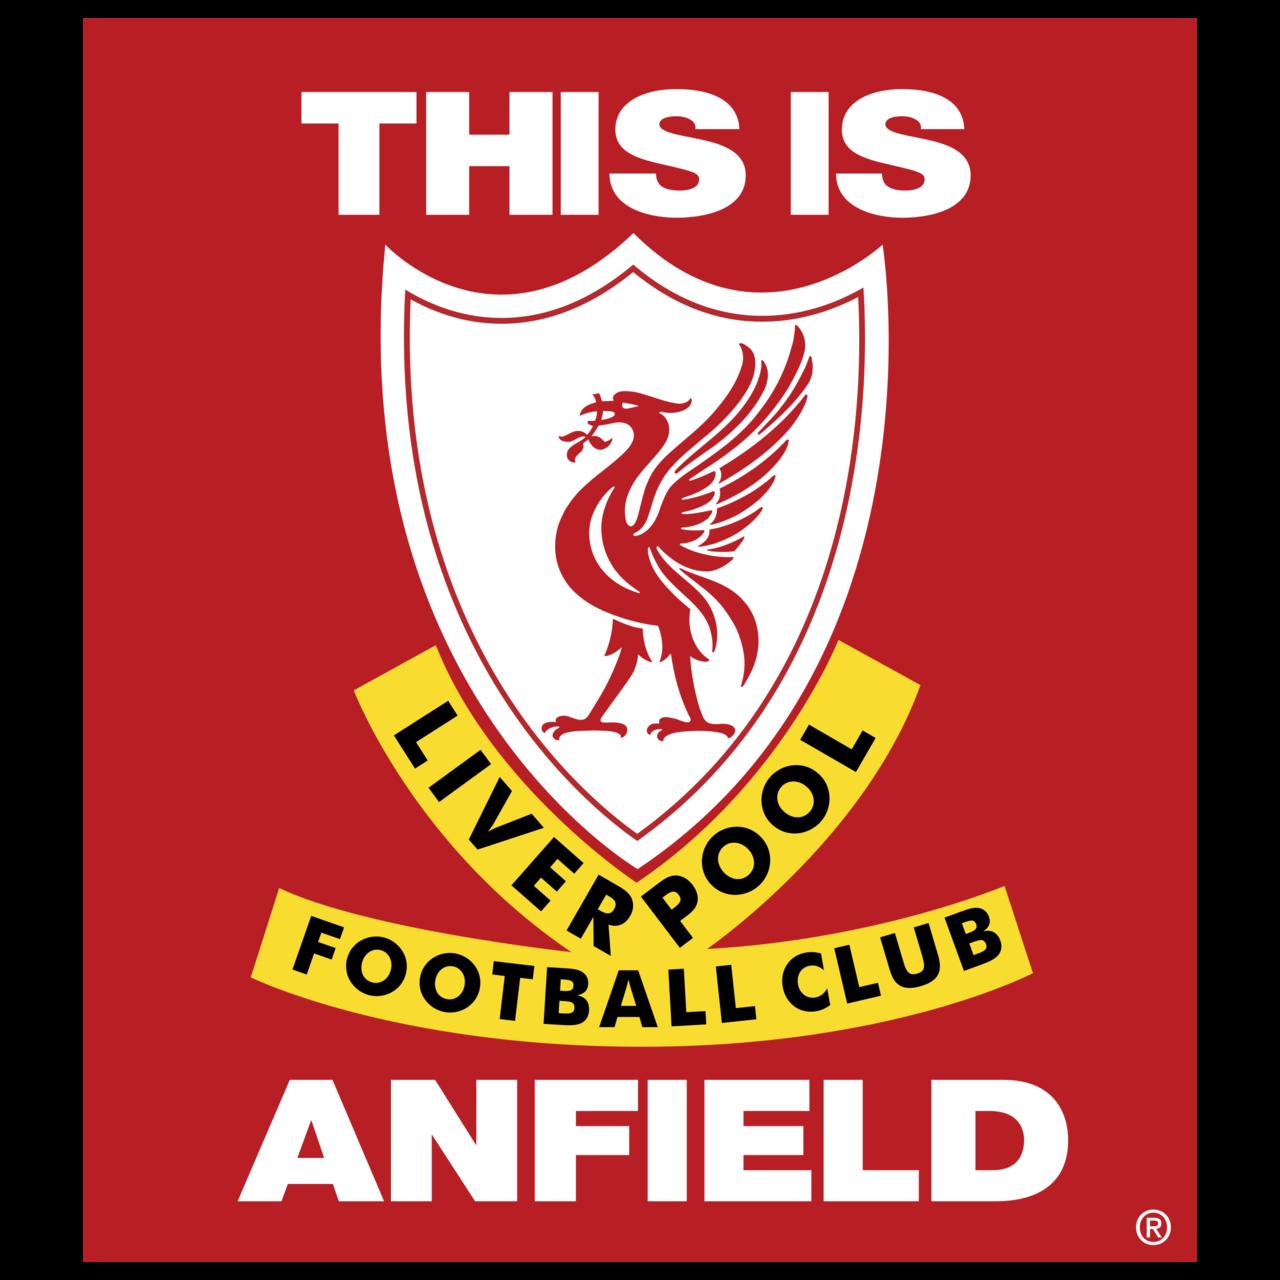 Liverpool Fc Logo Png Transparent 1 Brands Logos